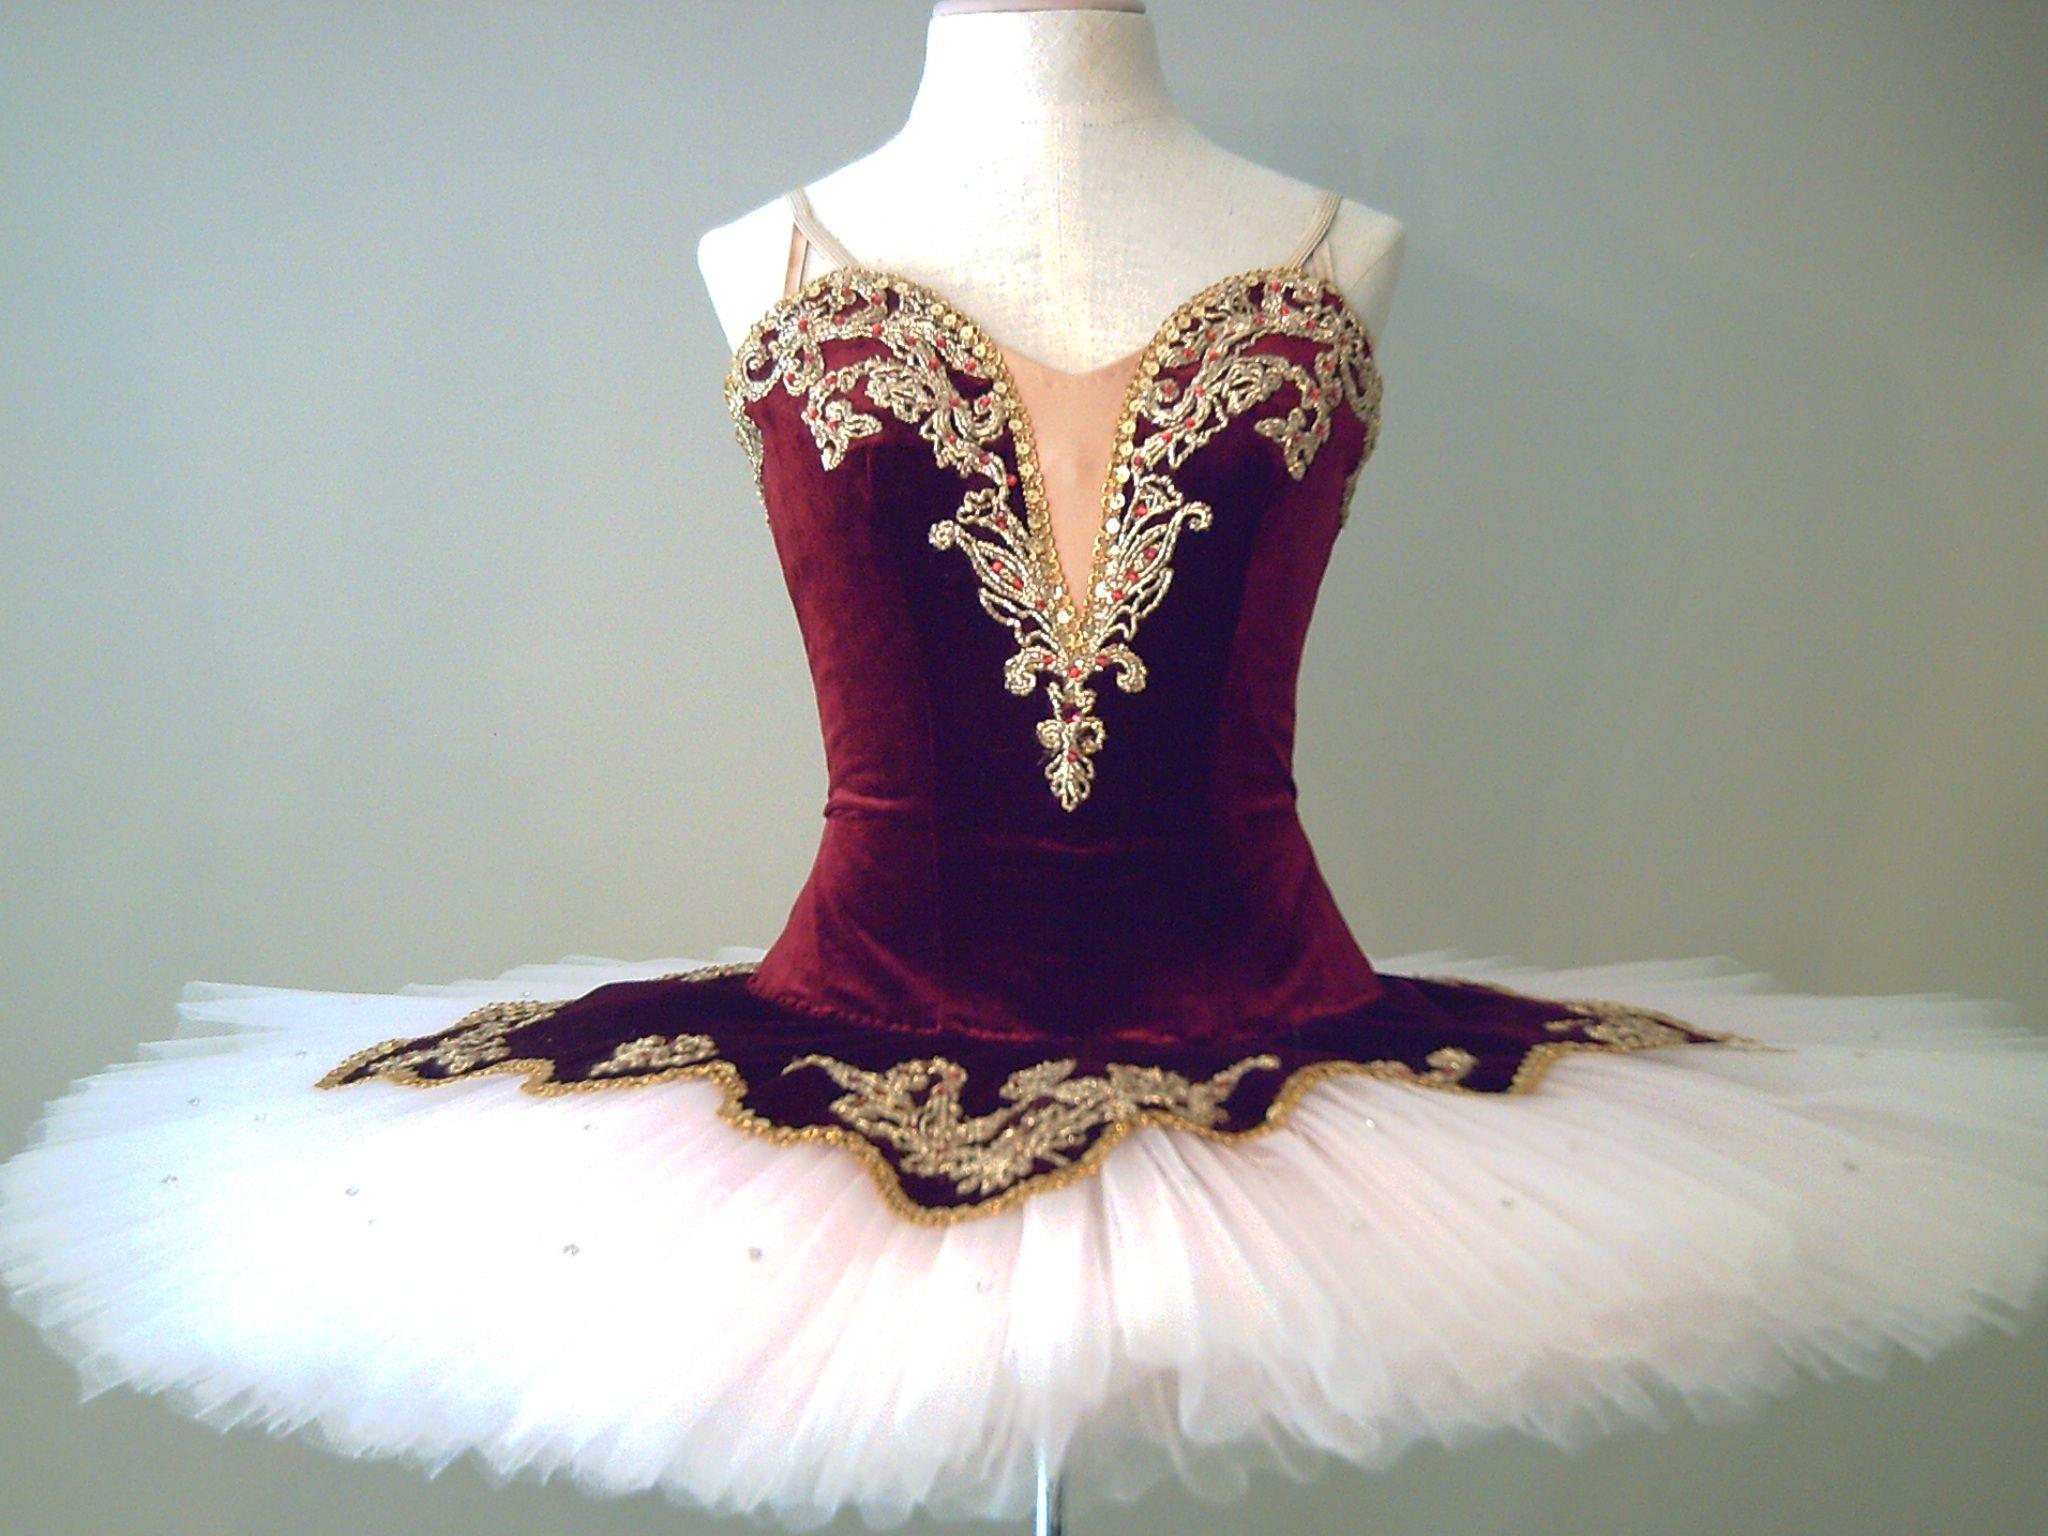 Home Decor Posters Ballet Costumes On Pinterest Ballet Tutu Jazz Dance